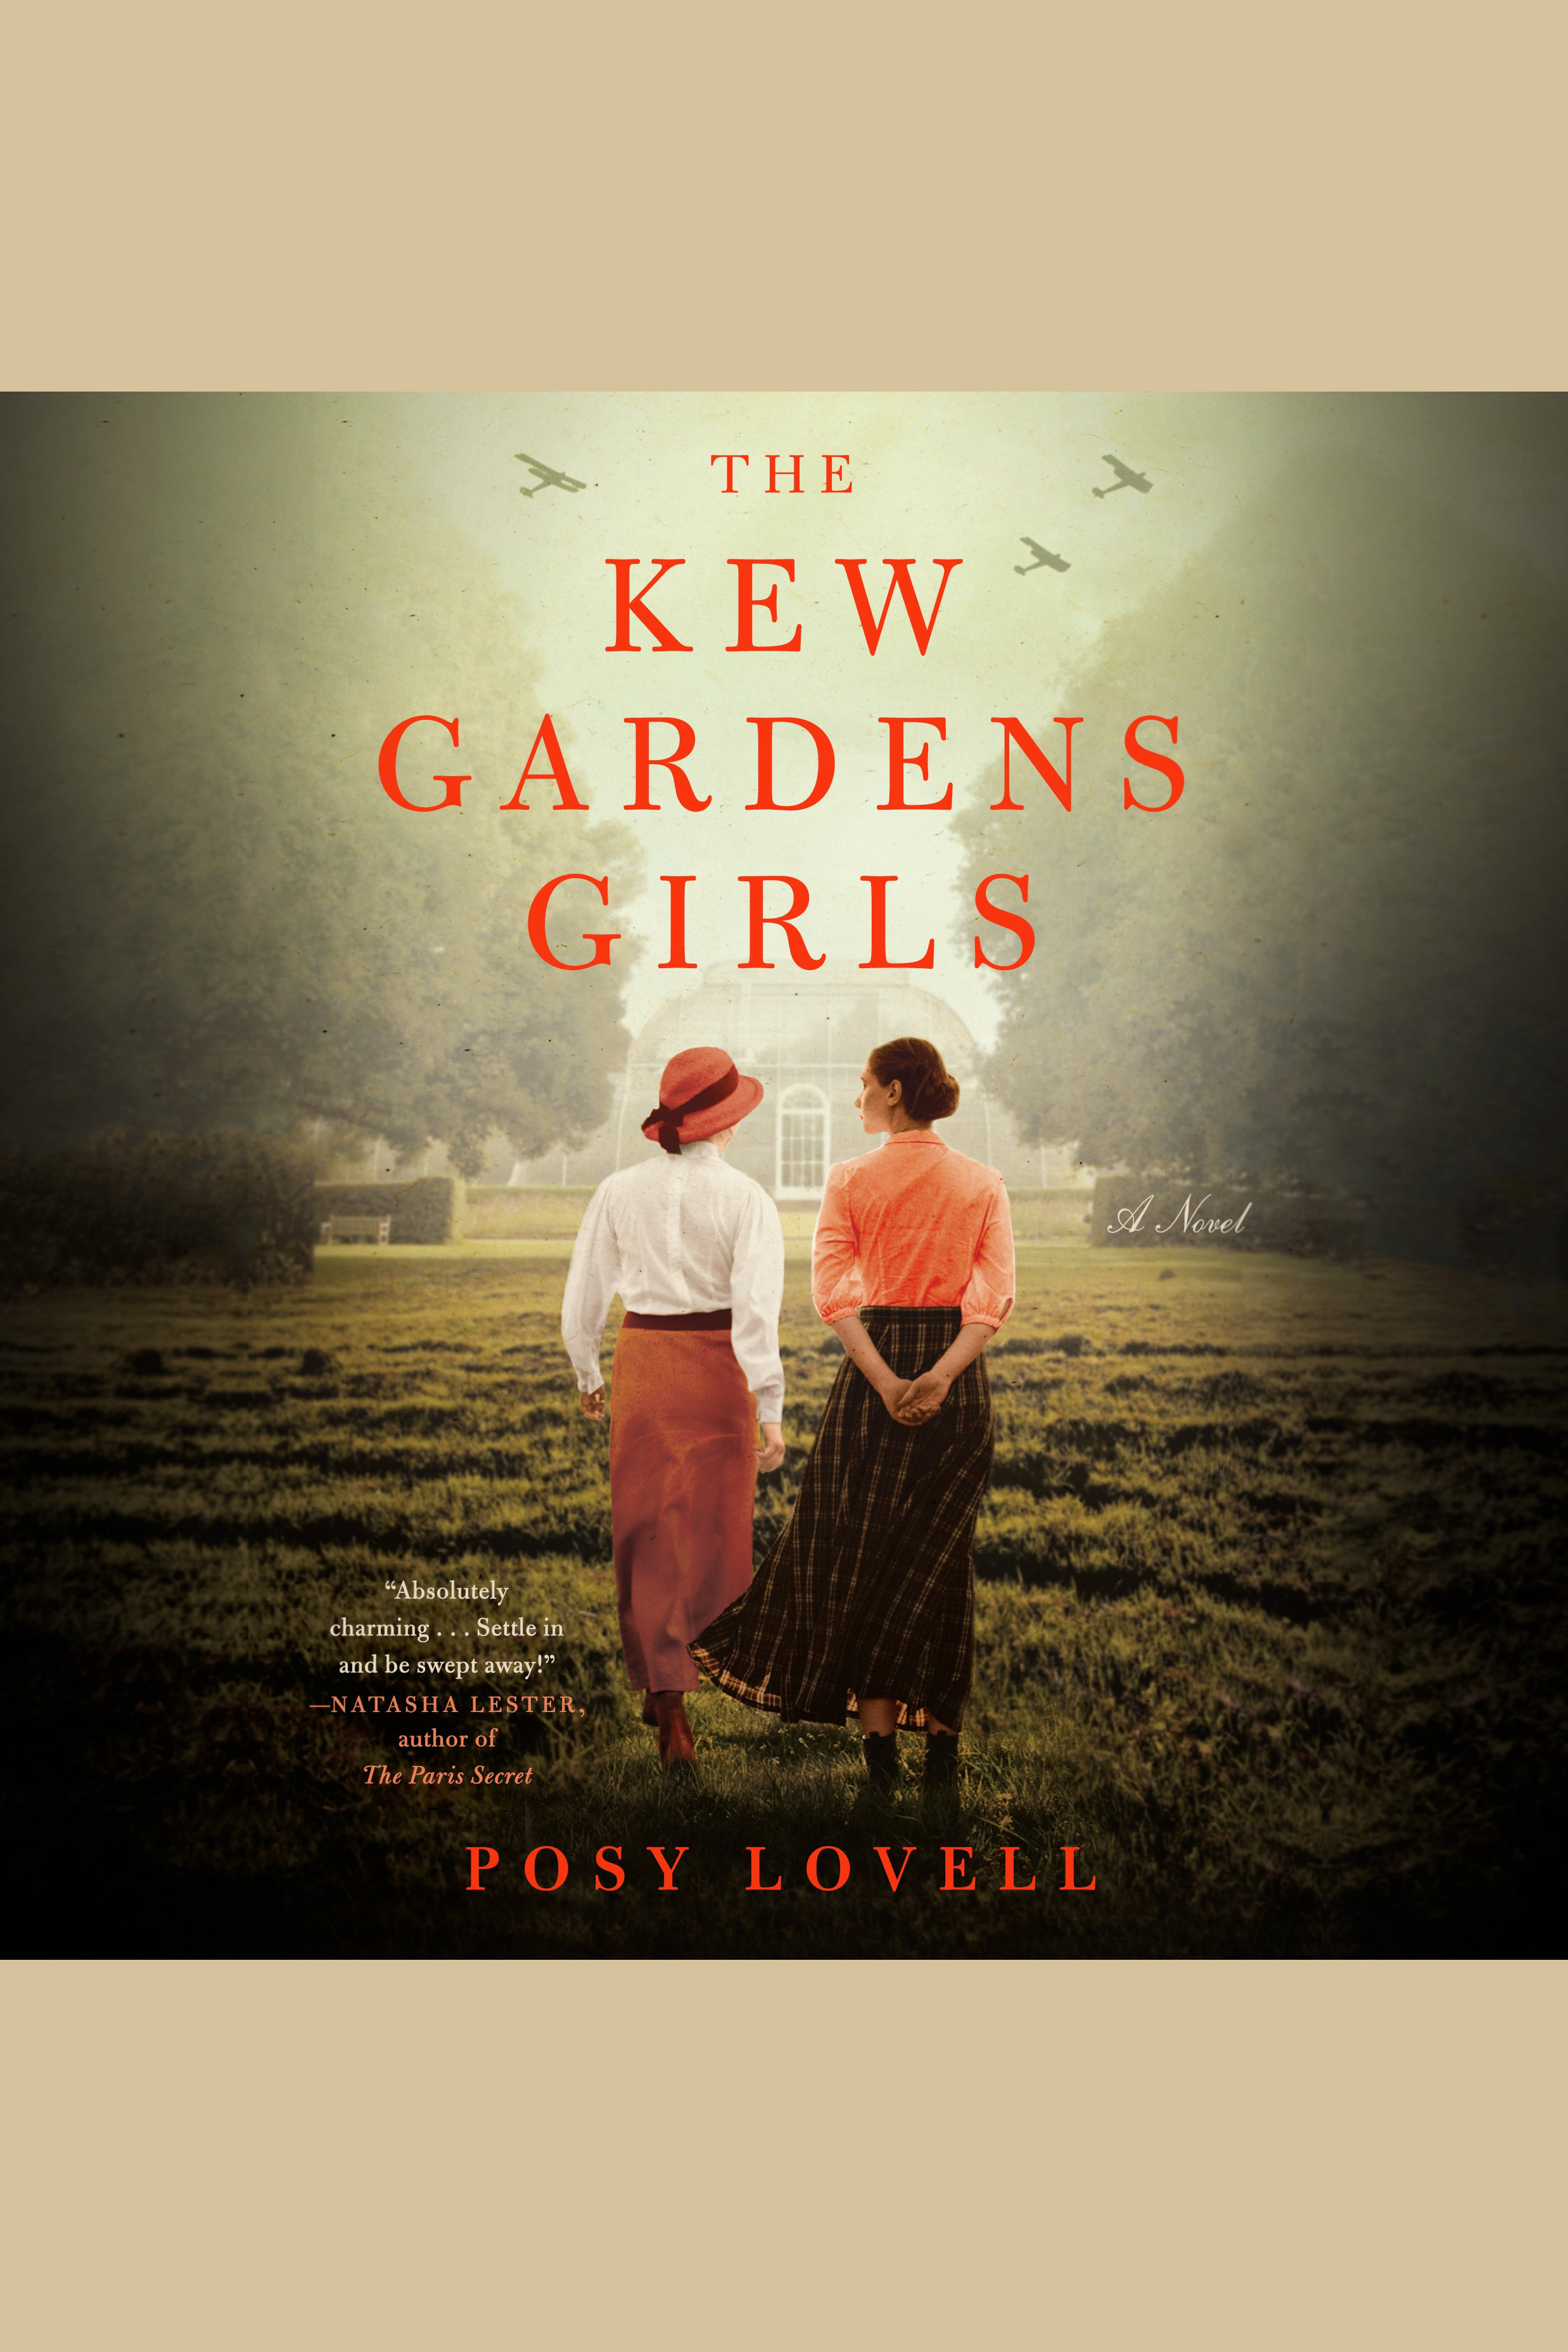 Kew Gardens Girls, The